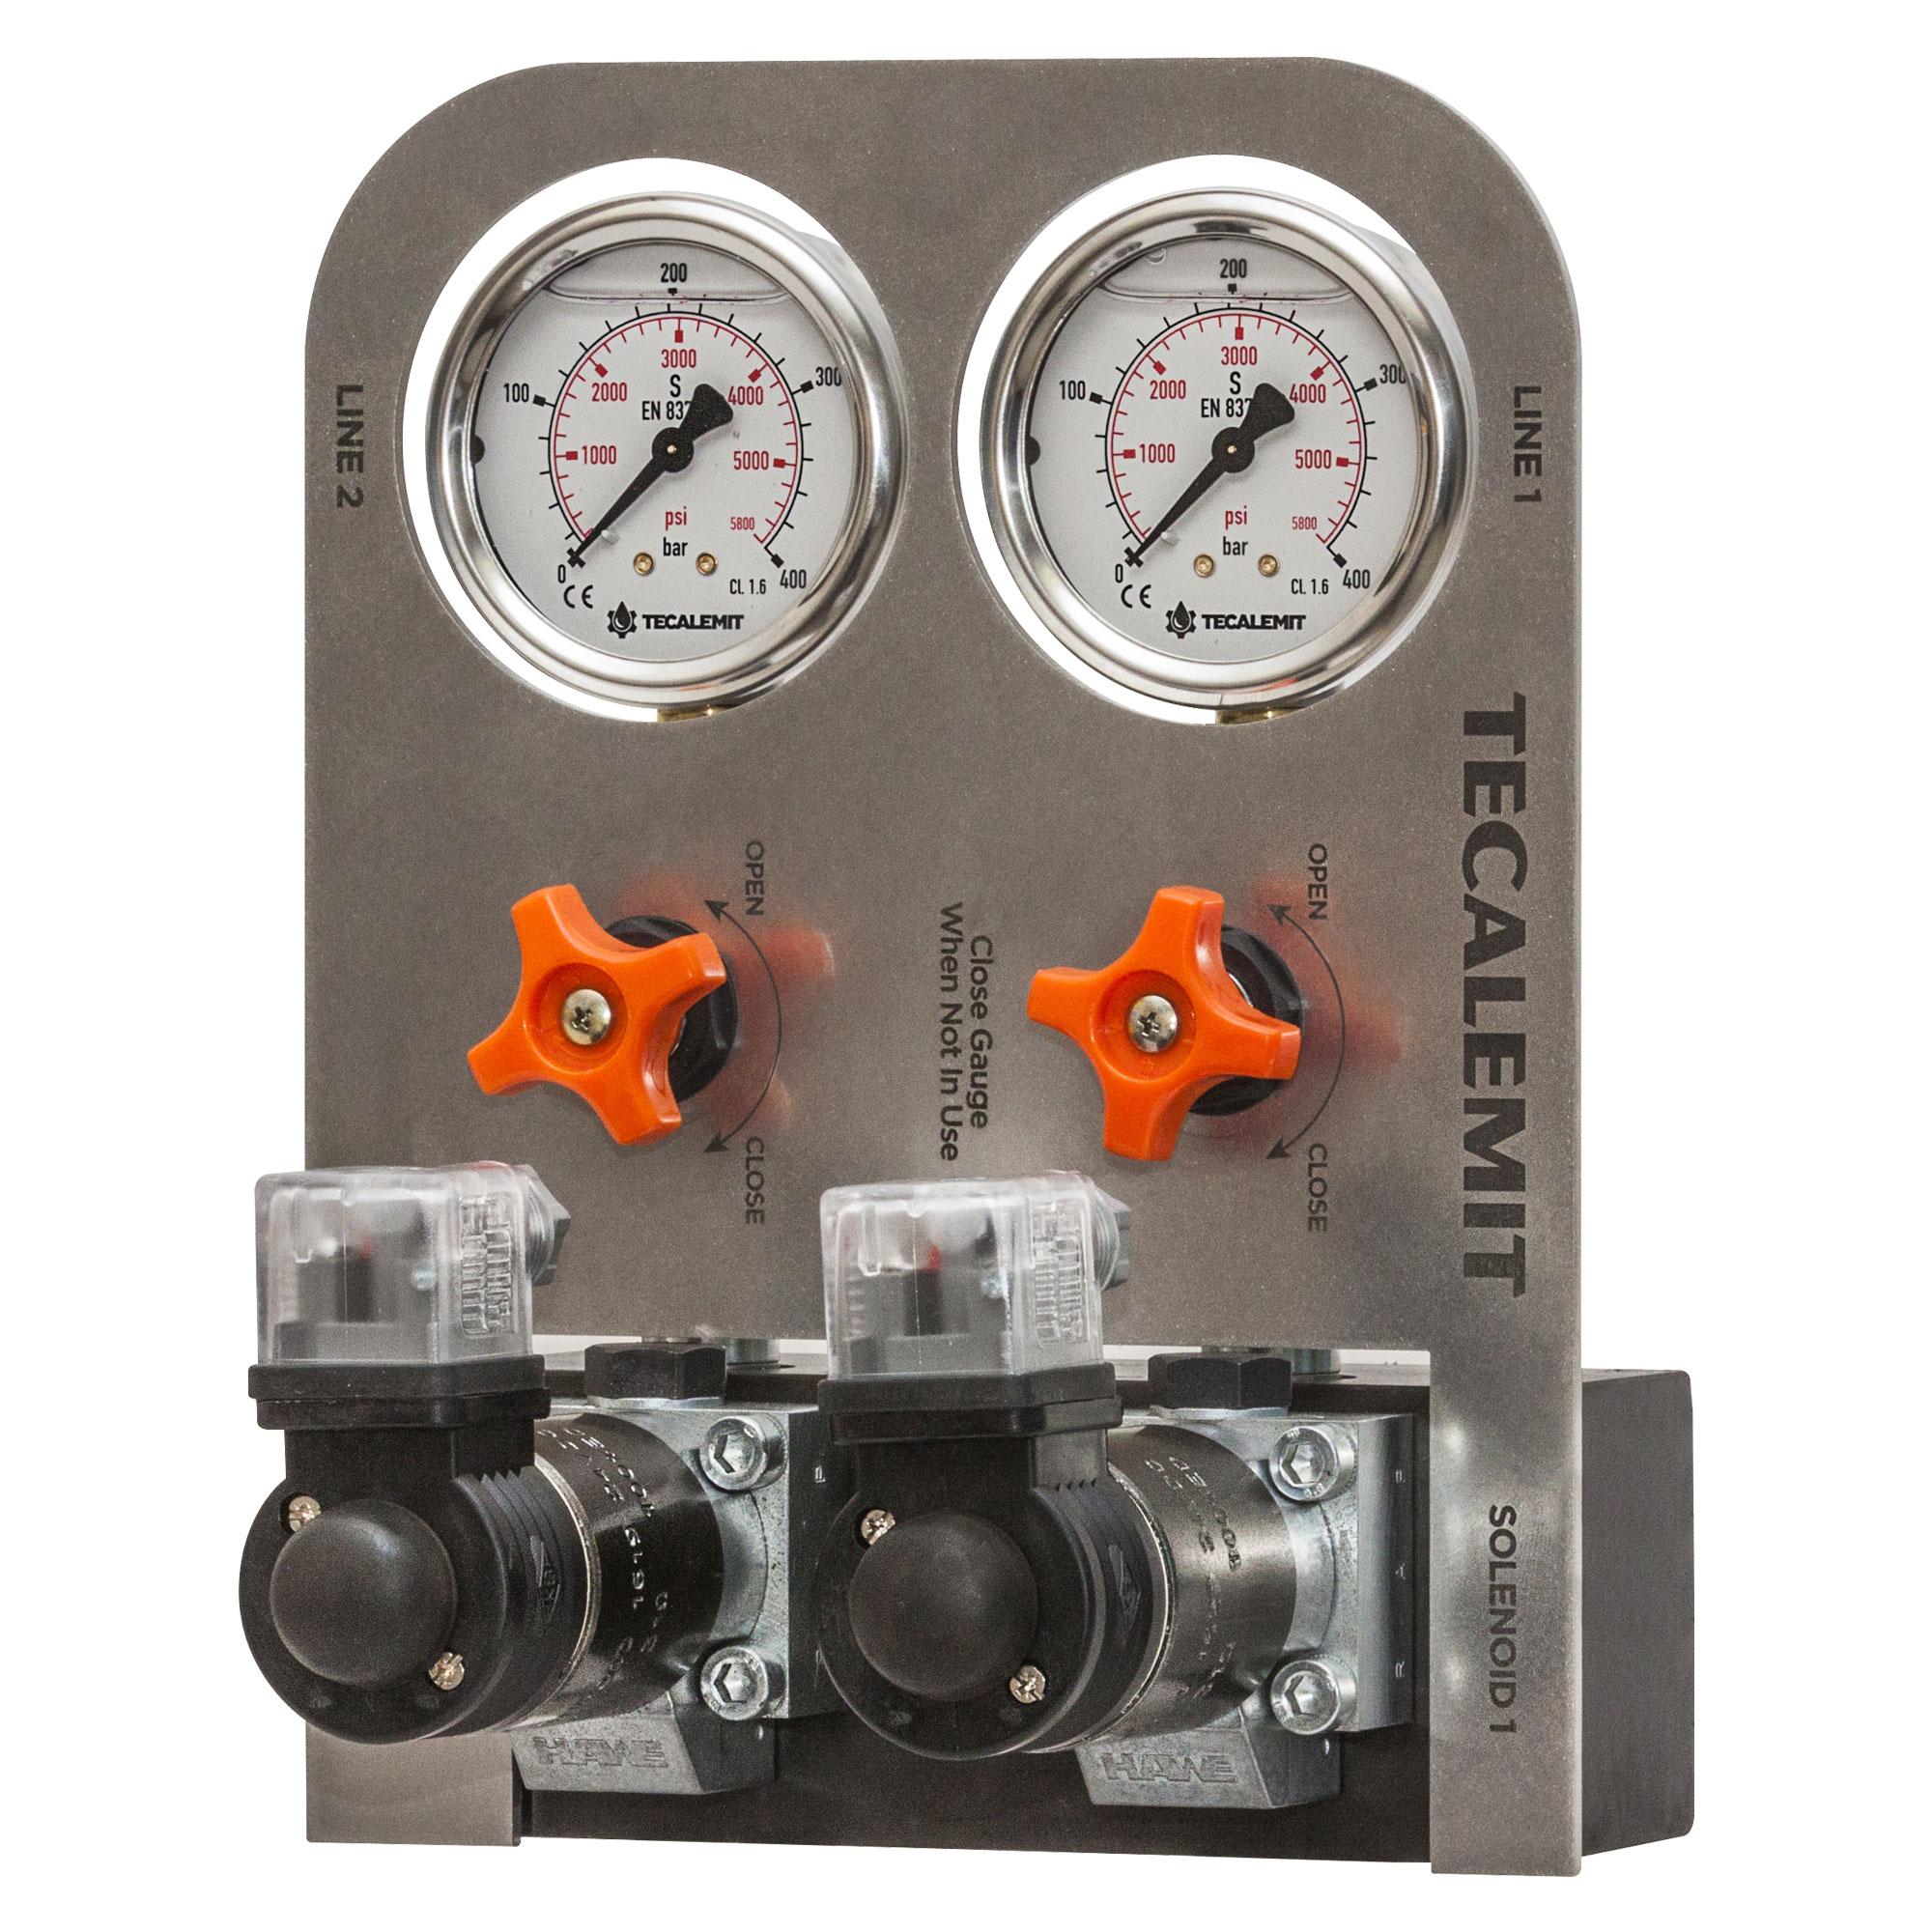 ERVA.24VDC - Electric Dual Line Grease Reversing Valve Assembly